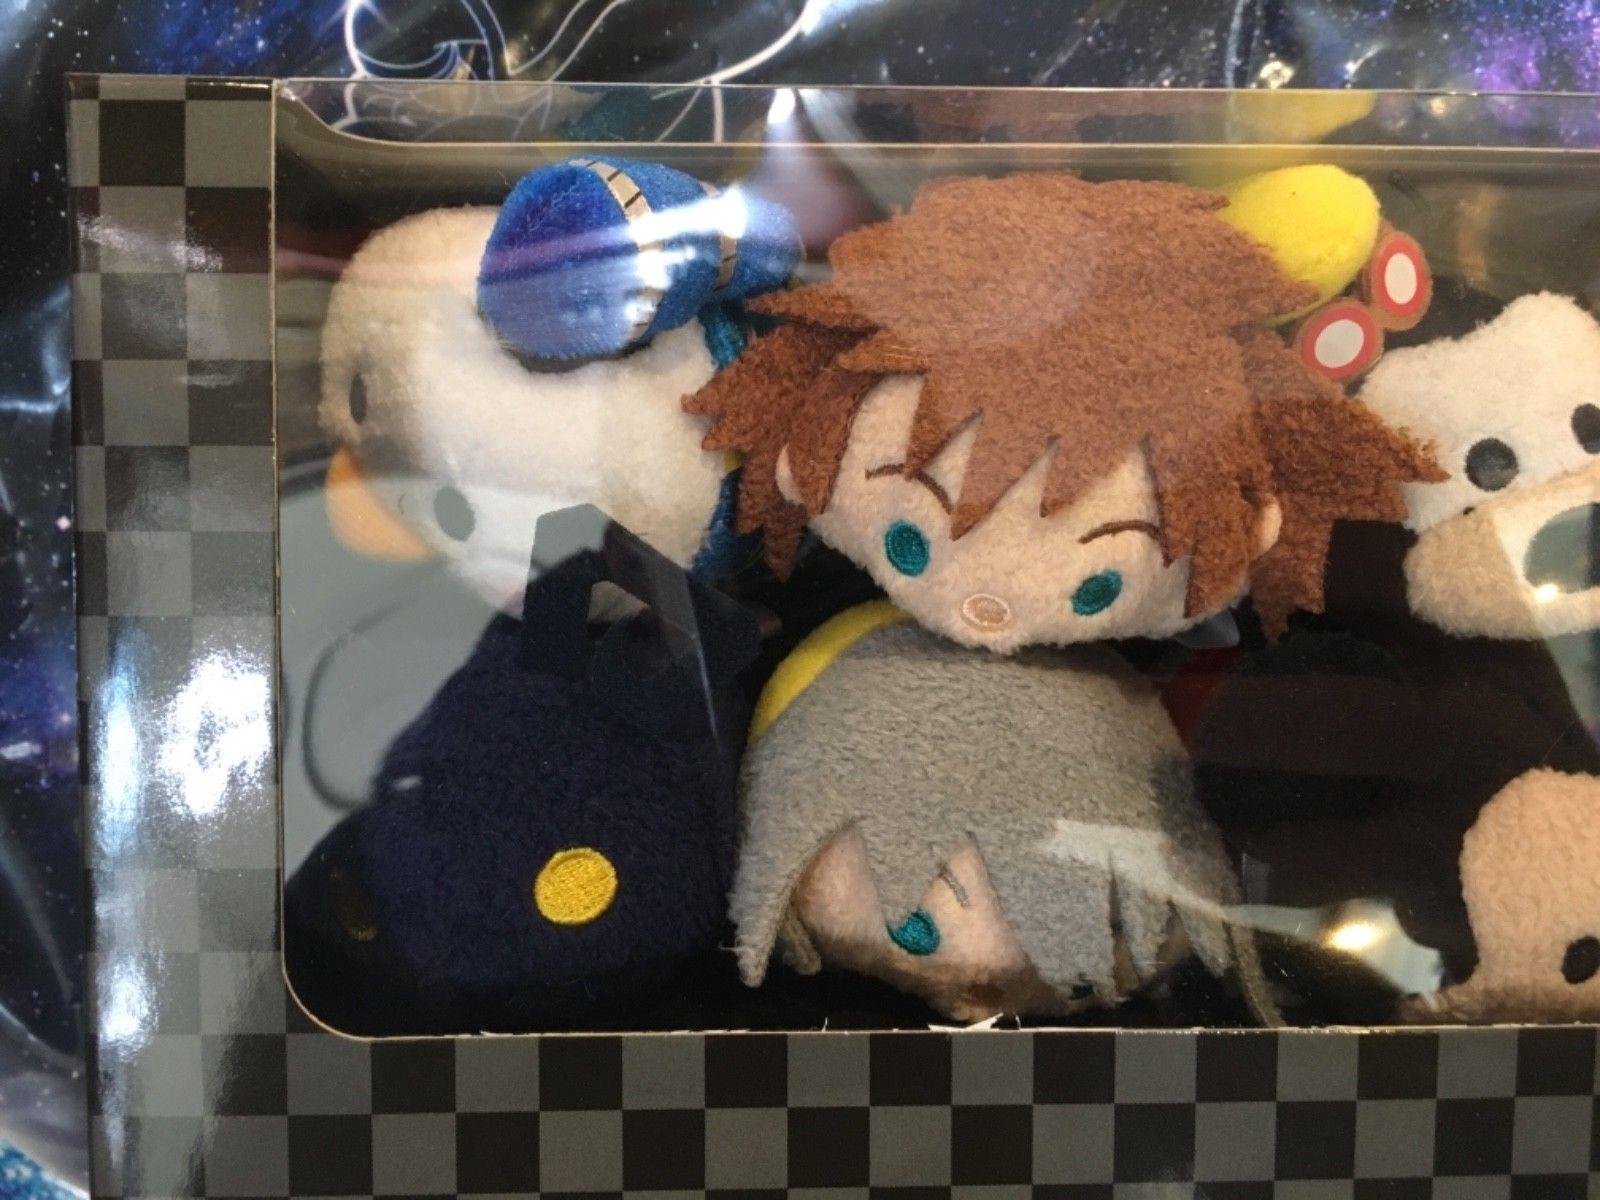 Kingdom Hearts III Kairi Disney TSUM TSUM Plush toy Gift #2